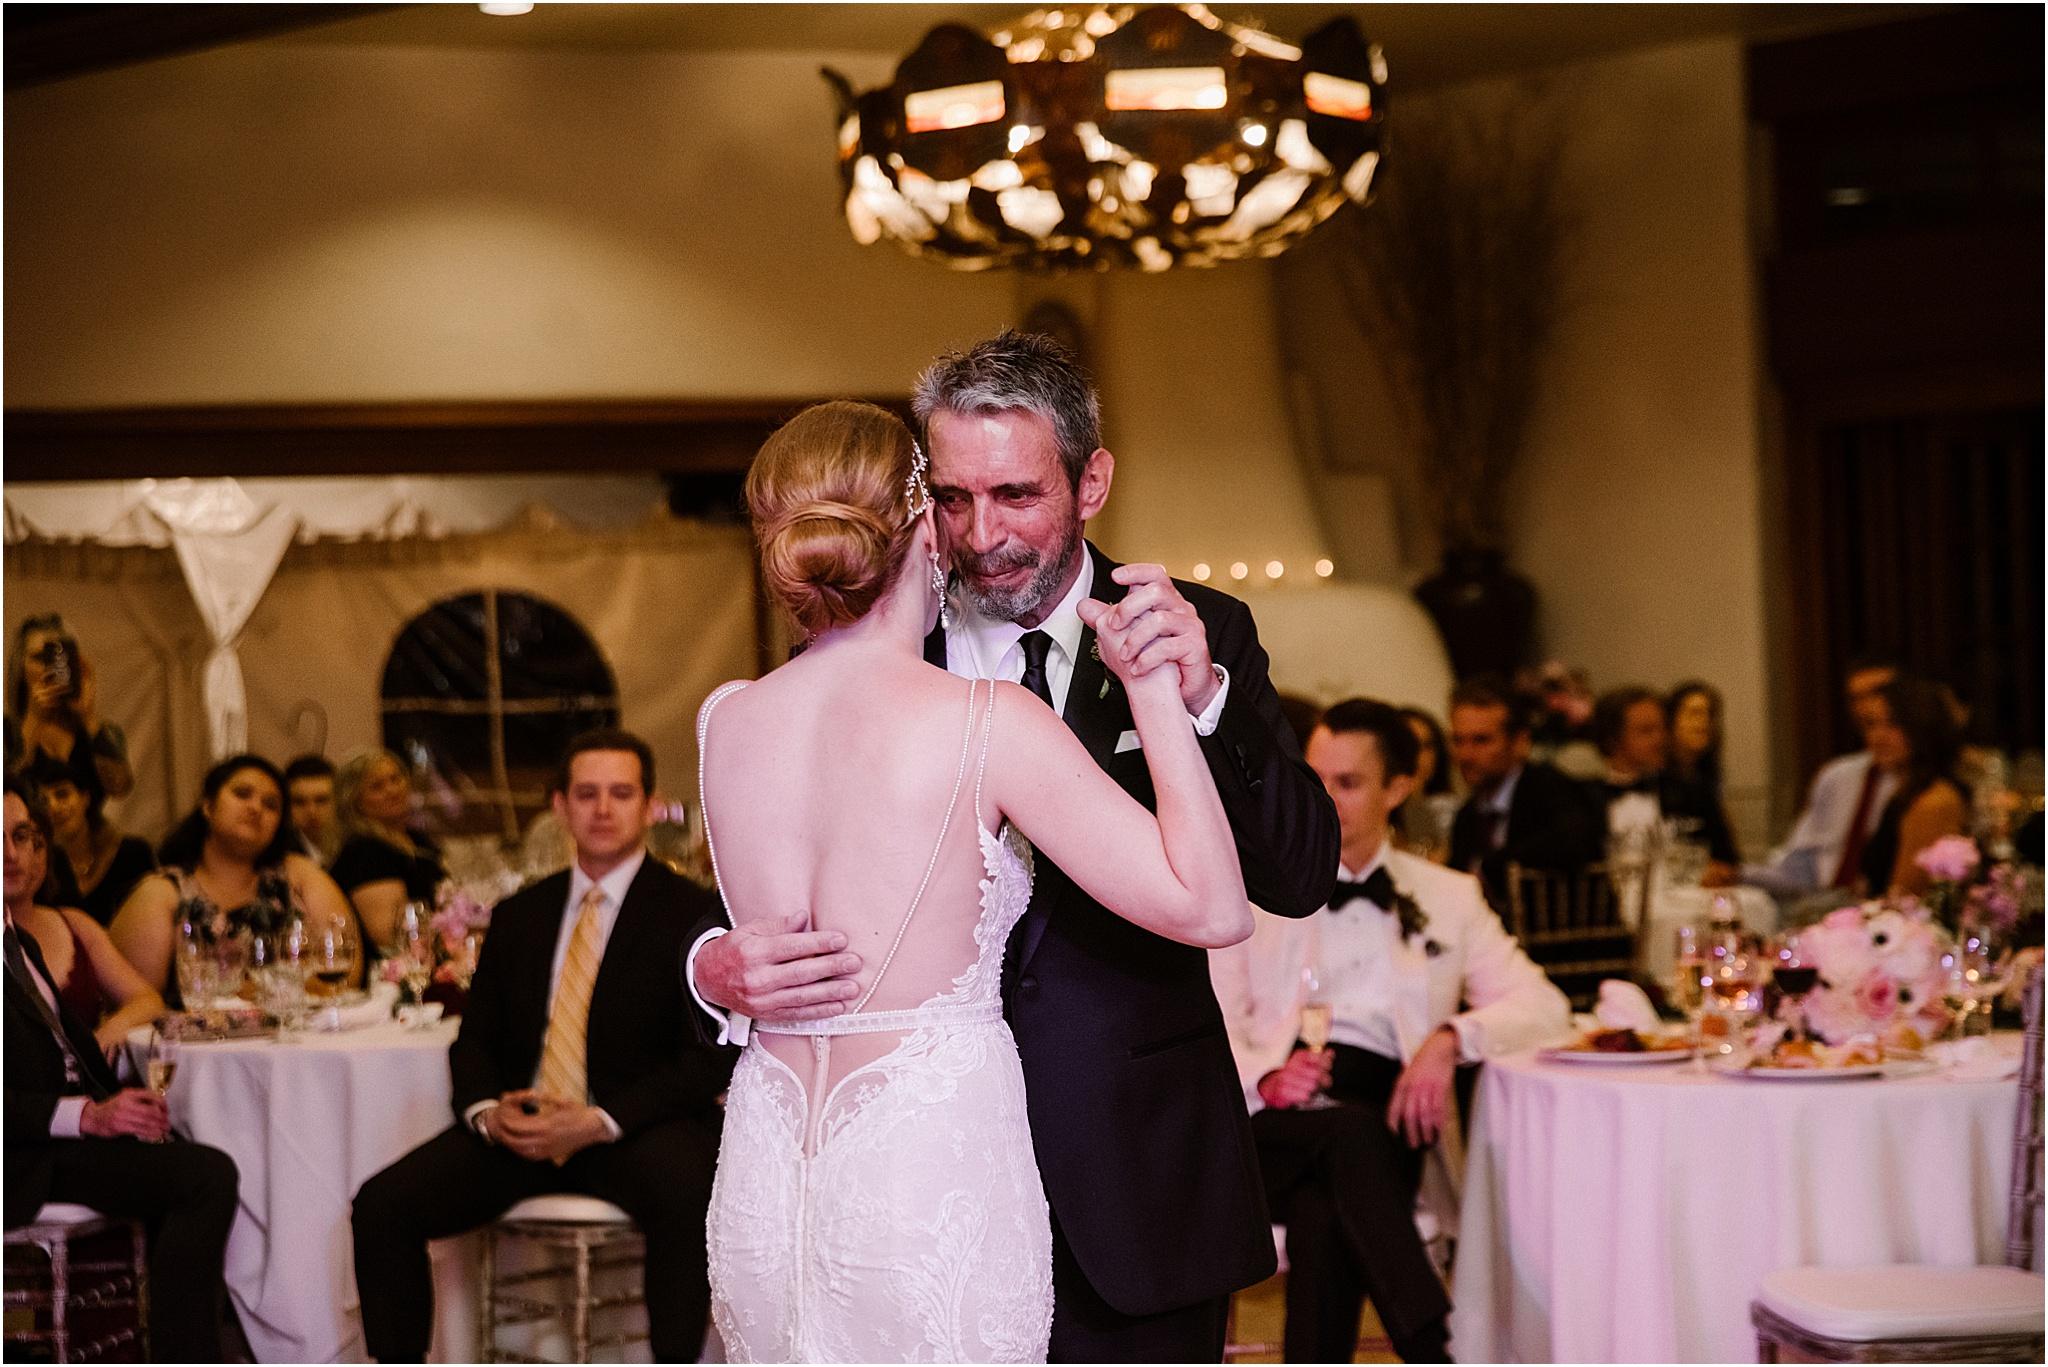 BLUE ROSE PHOTOGRAPHY SANTA FE WEDDING_70